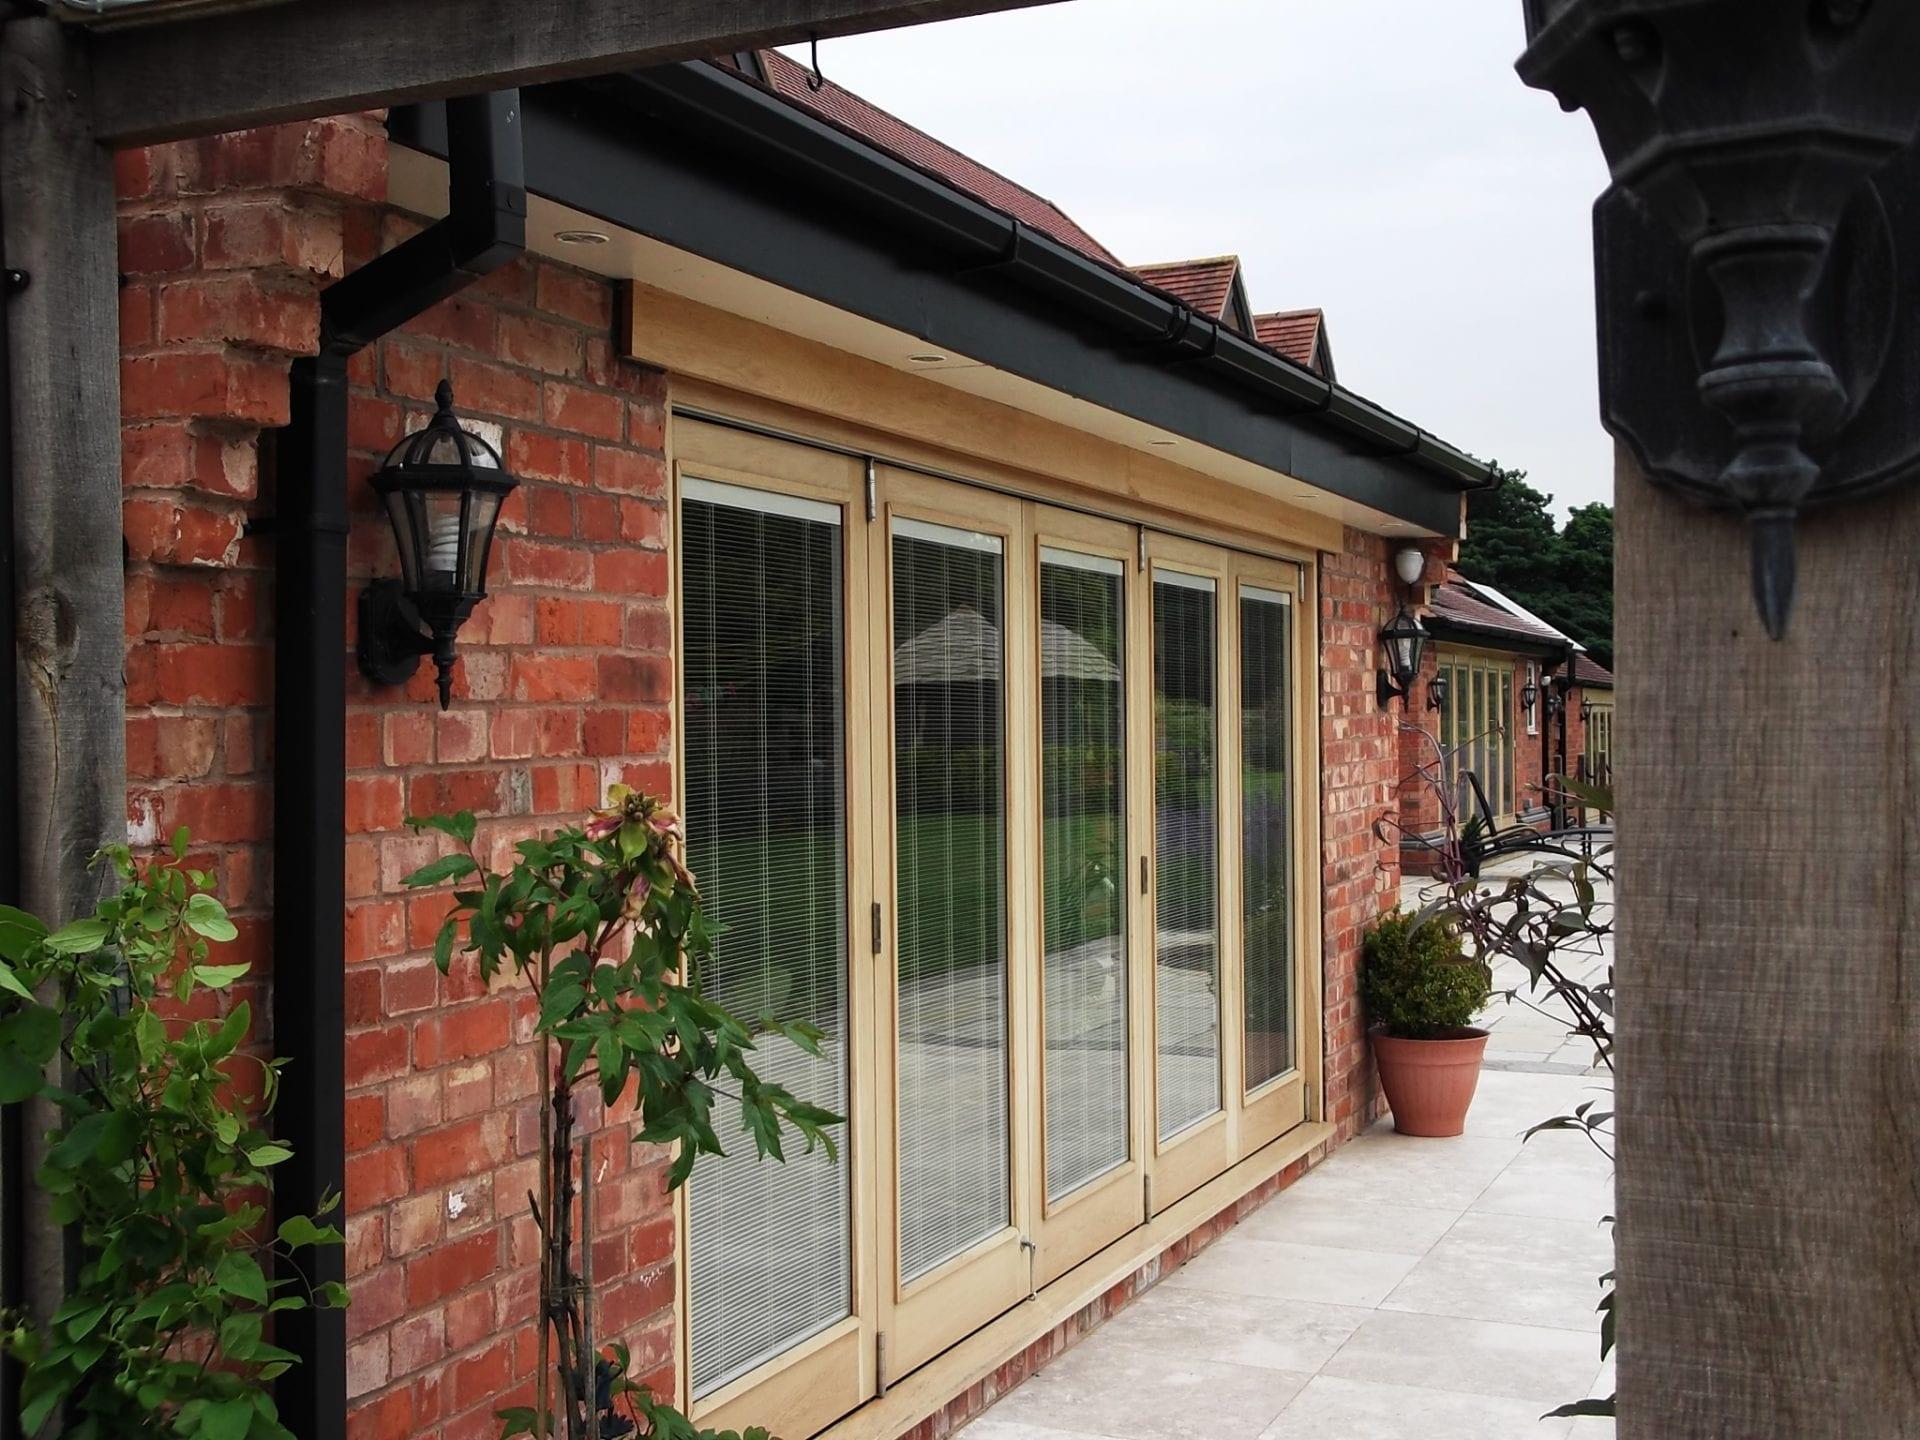 Wooden lift and slide doors looking over a nice patio